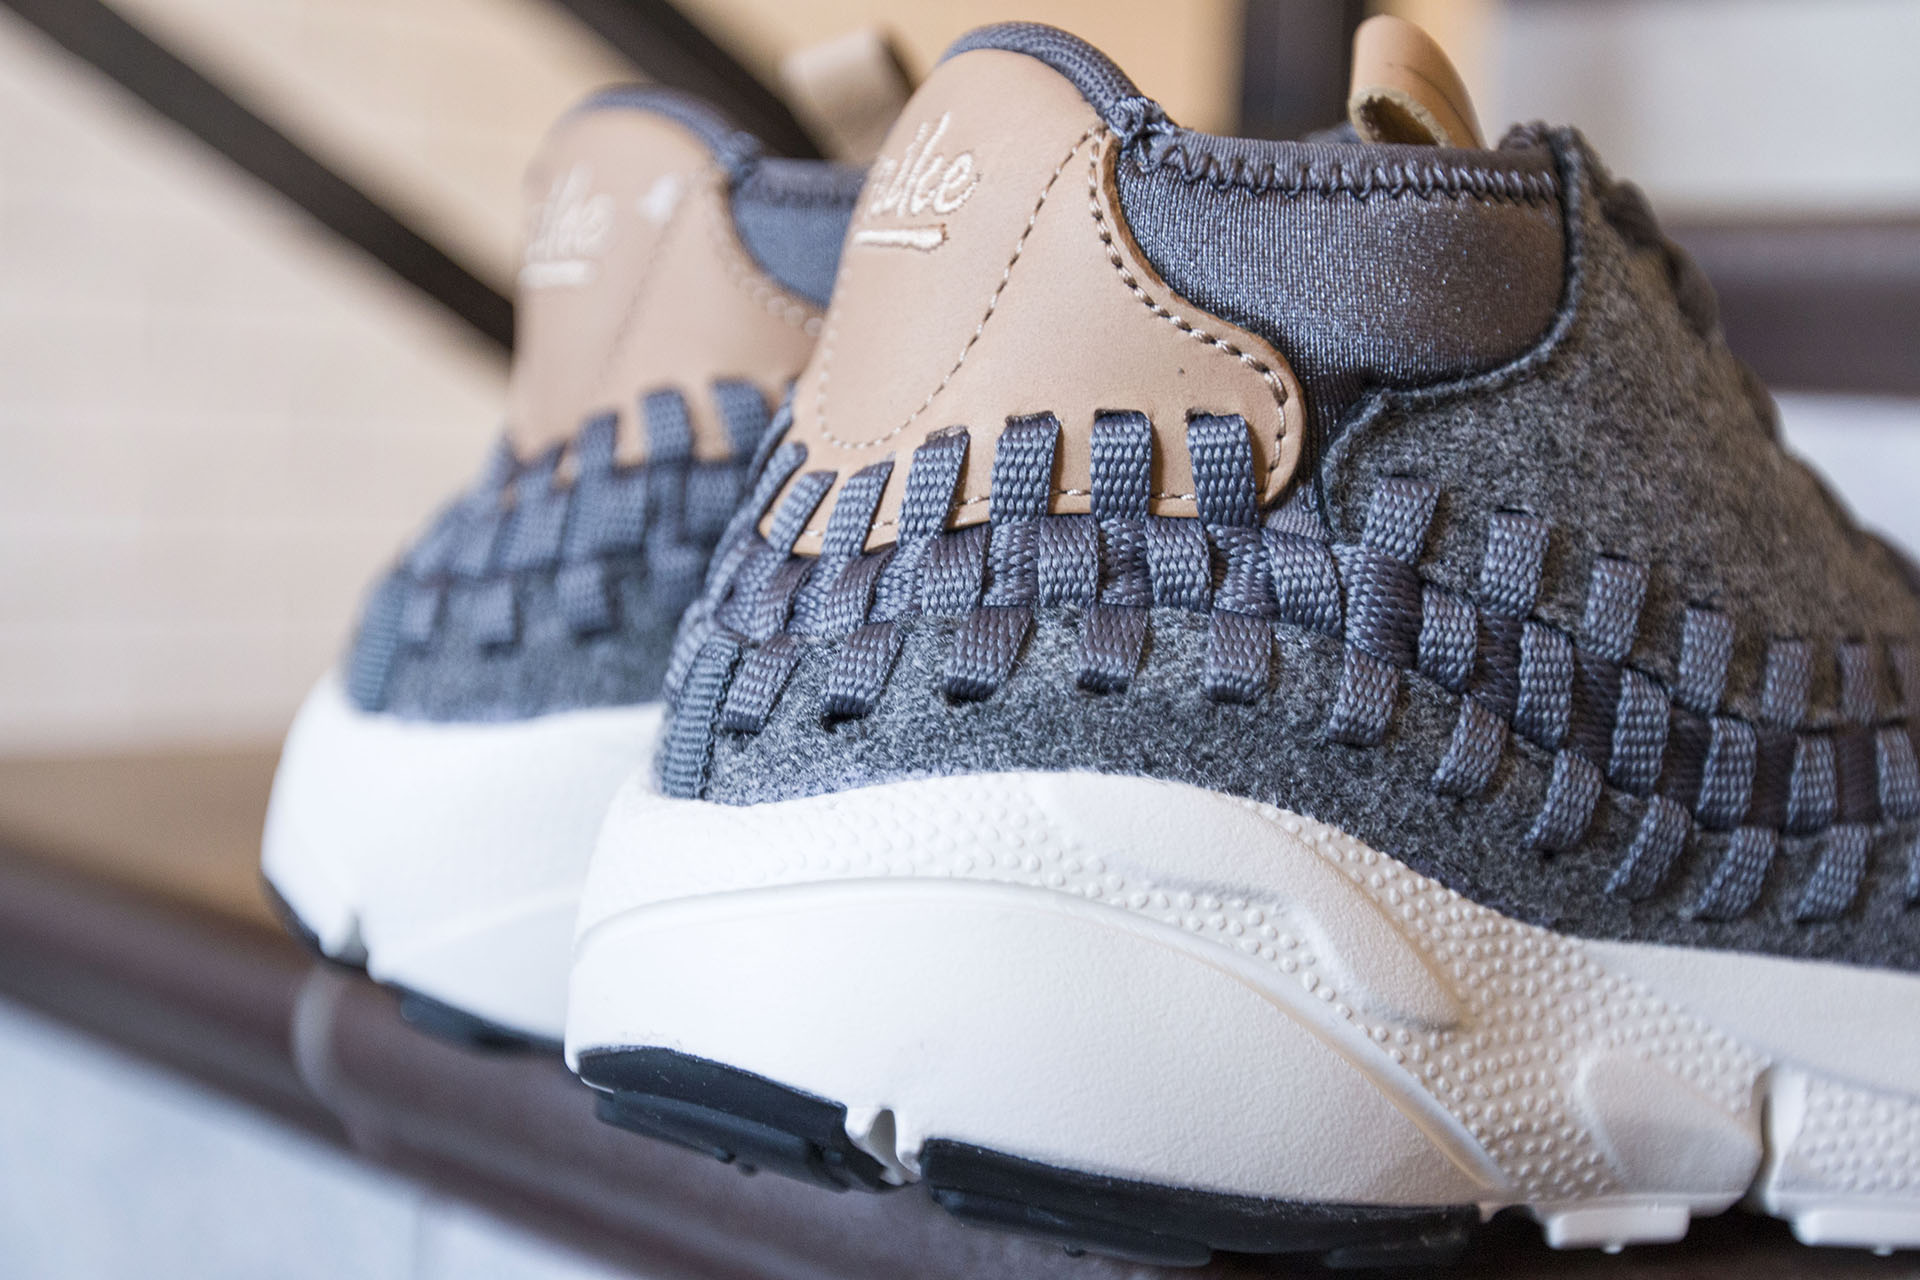 sports shoes 1bb4e 32dc0 ... Купить мужские серые кроссовки Nike Air Footscape Woven Chukka SE - фото  2 картинки ...